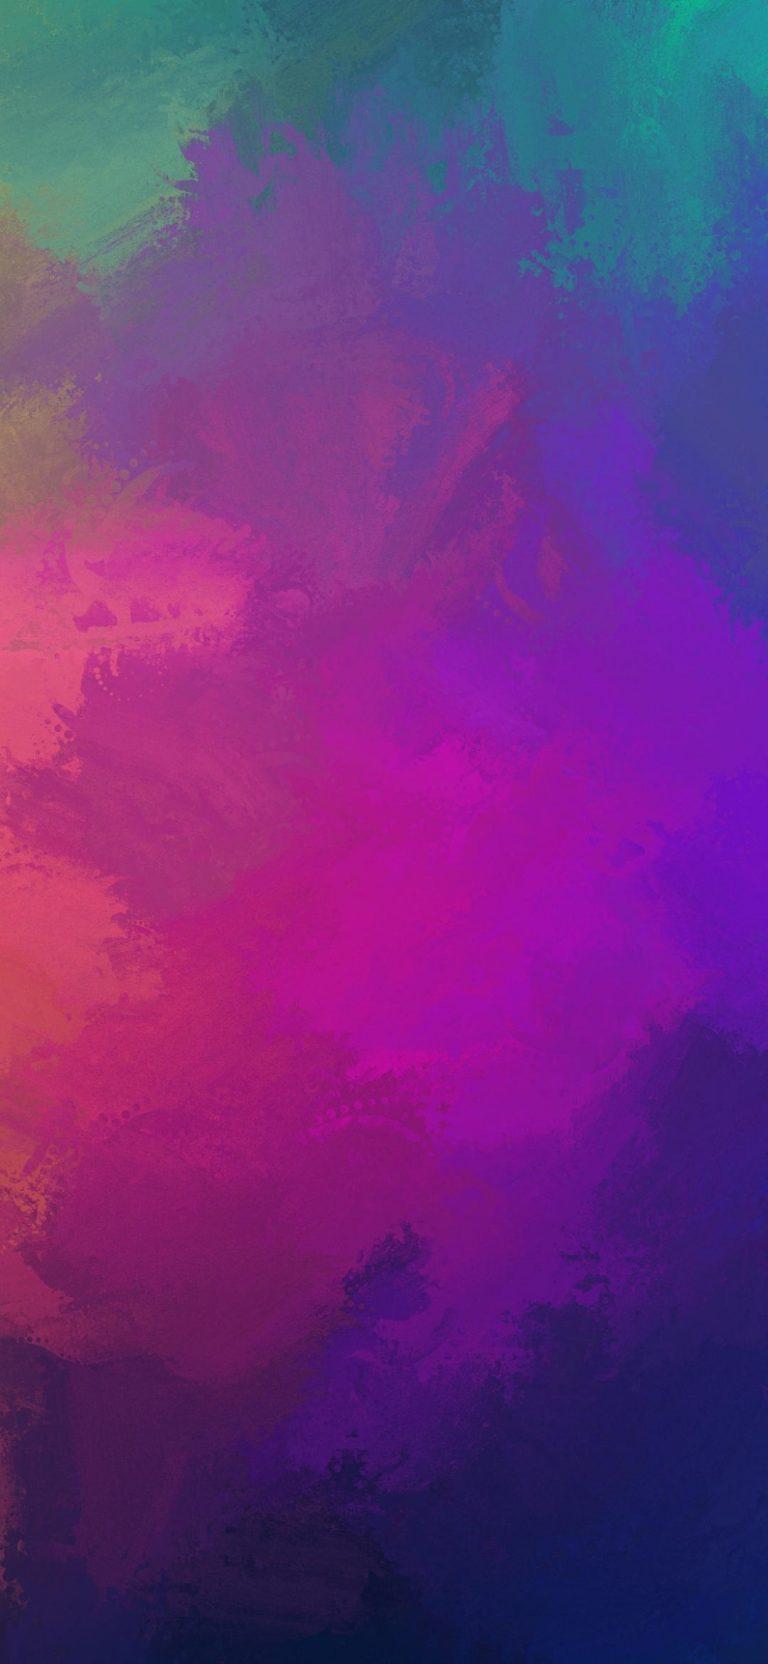 WhatsApp Background Wallpaper 24 768x1664 - WhatsApp Background Wallpaper - 24